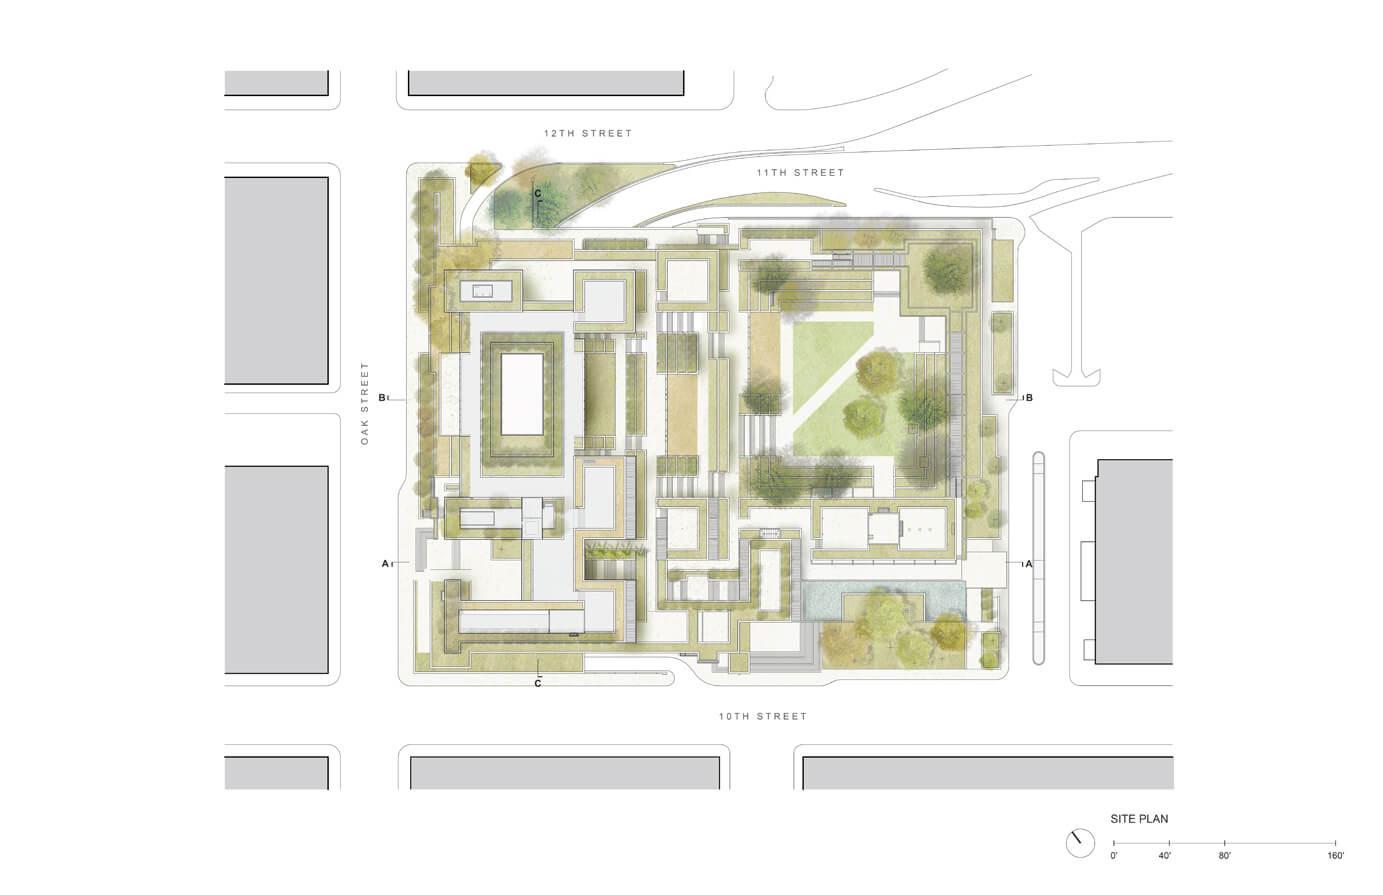 Site plan - image (www.cavagnero.com)